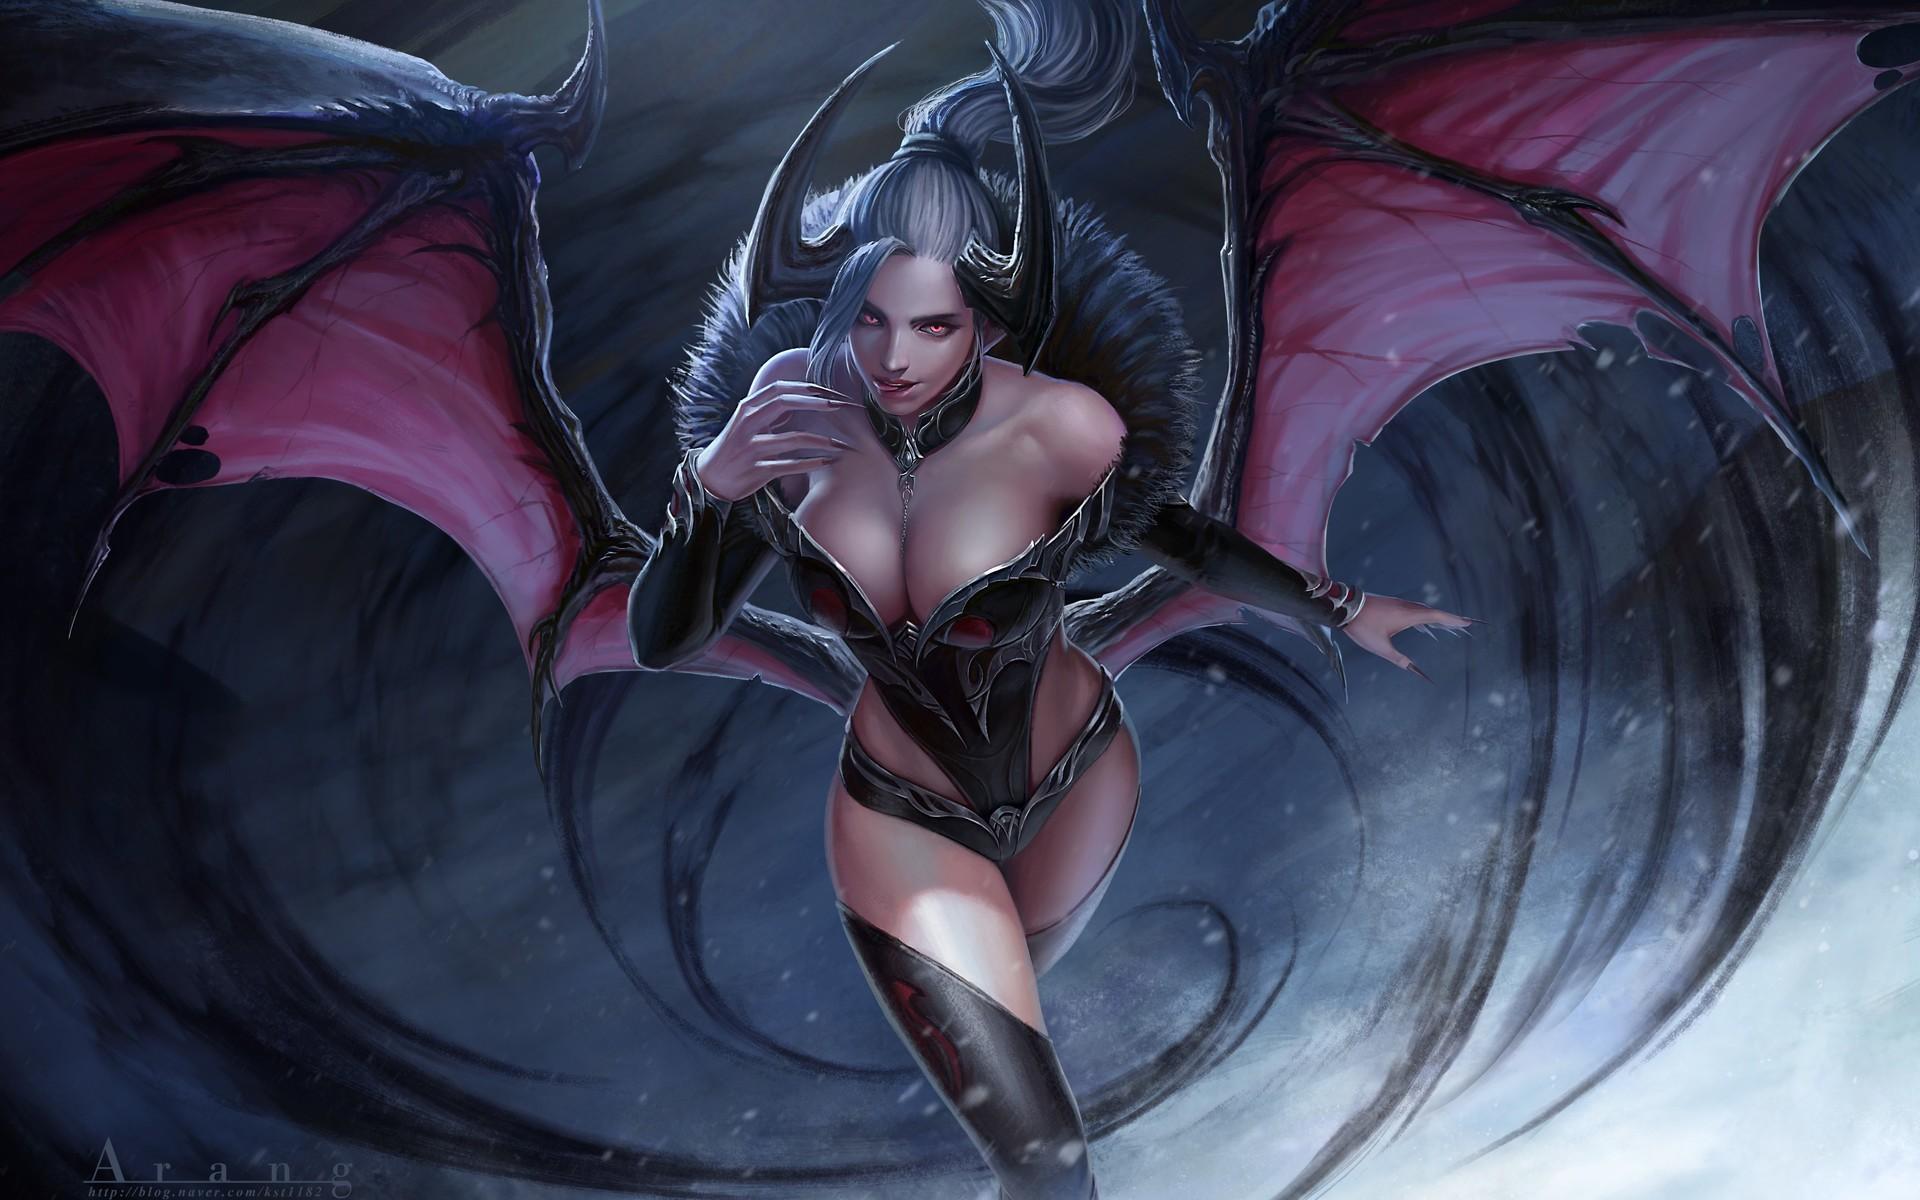 Hot naked anima demon girl nude image